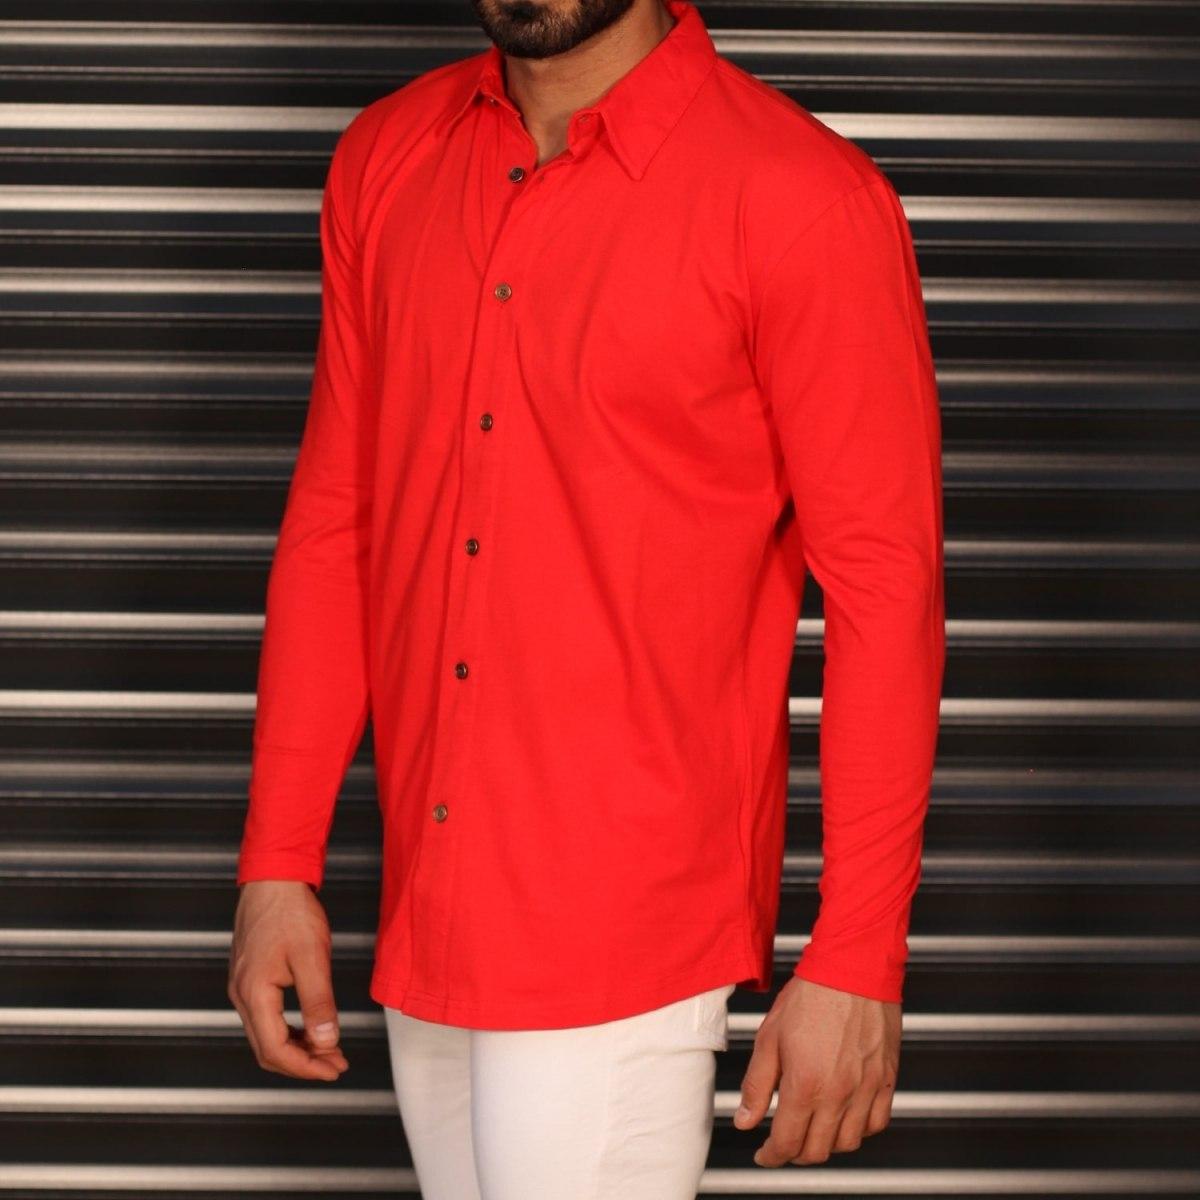 Men's Regular Long Sleeve Casual Shirt In Red Mv Premium Brand - 2